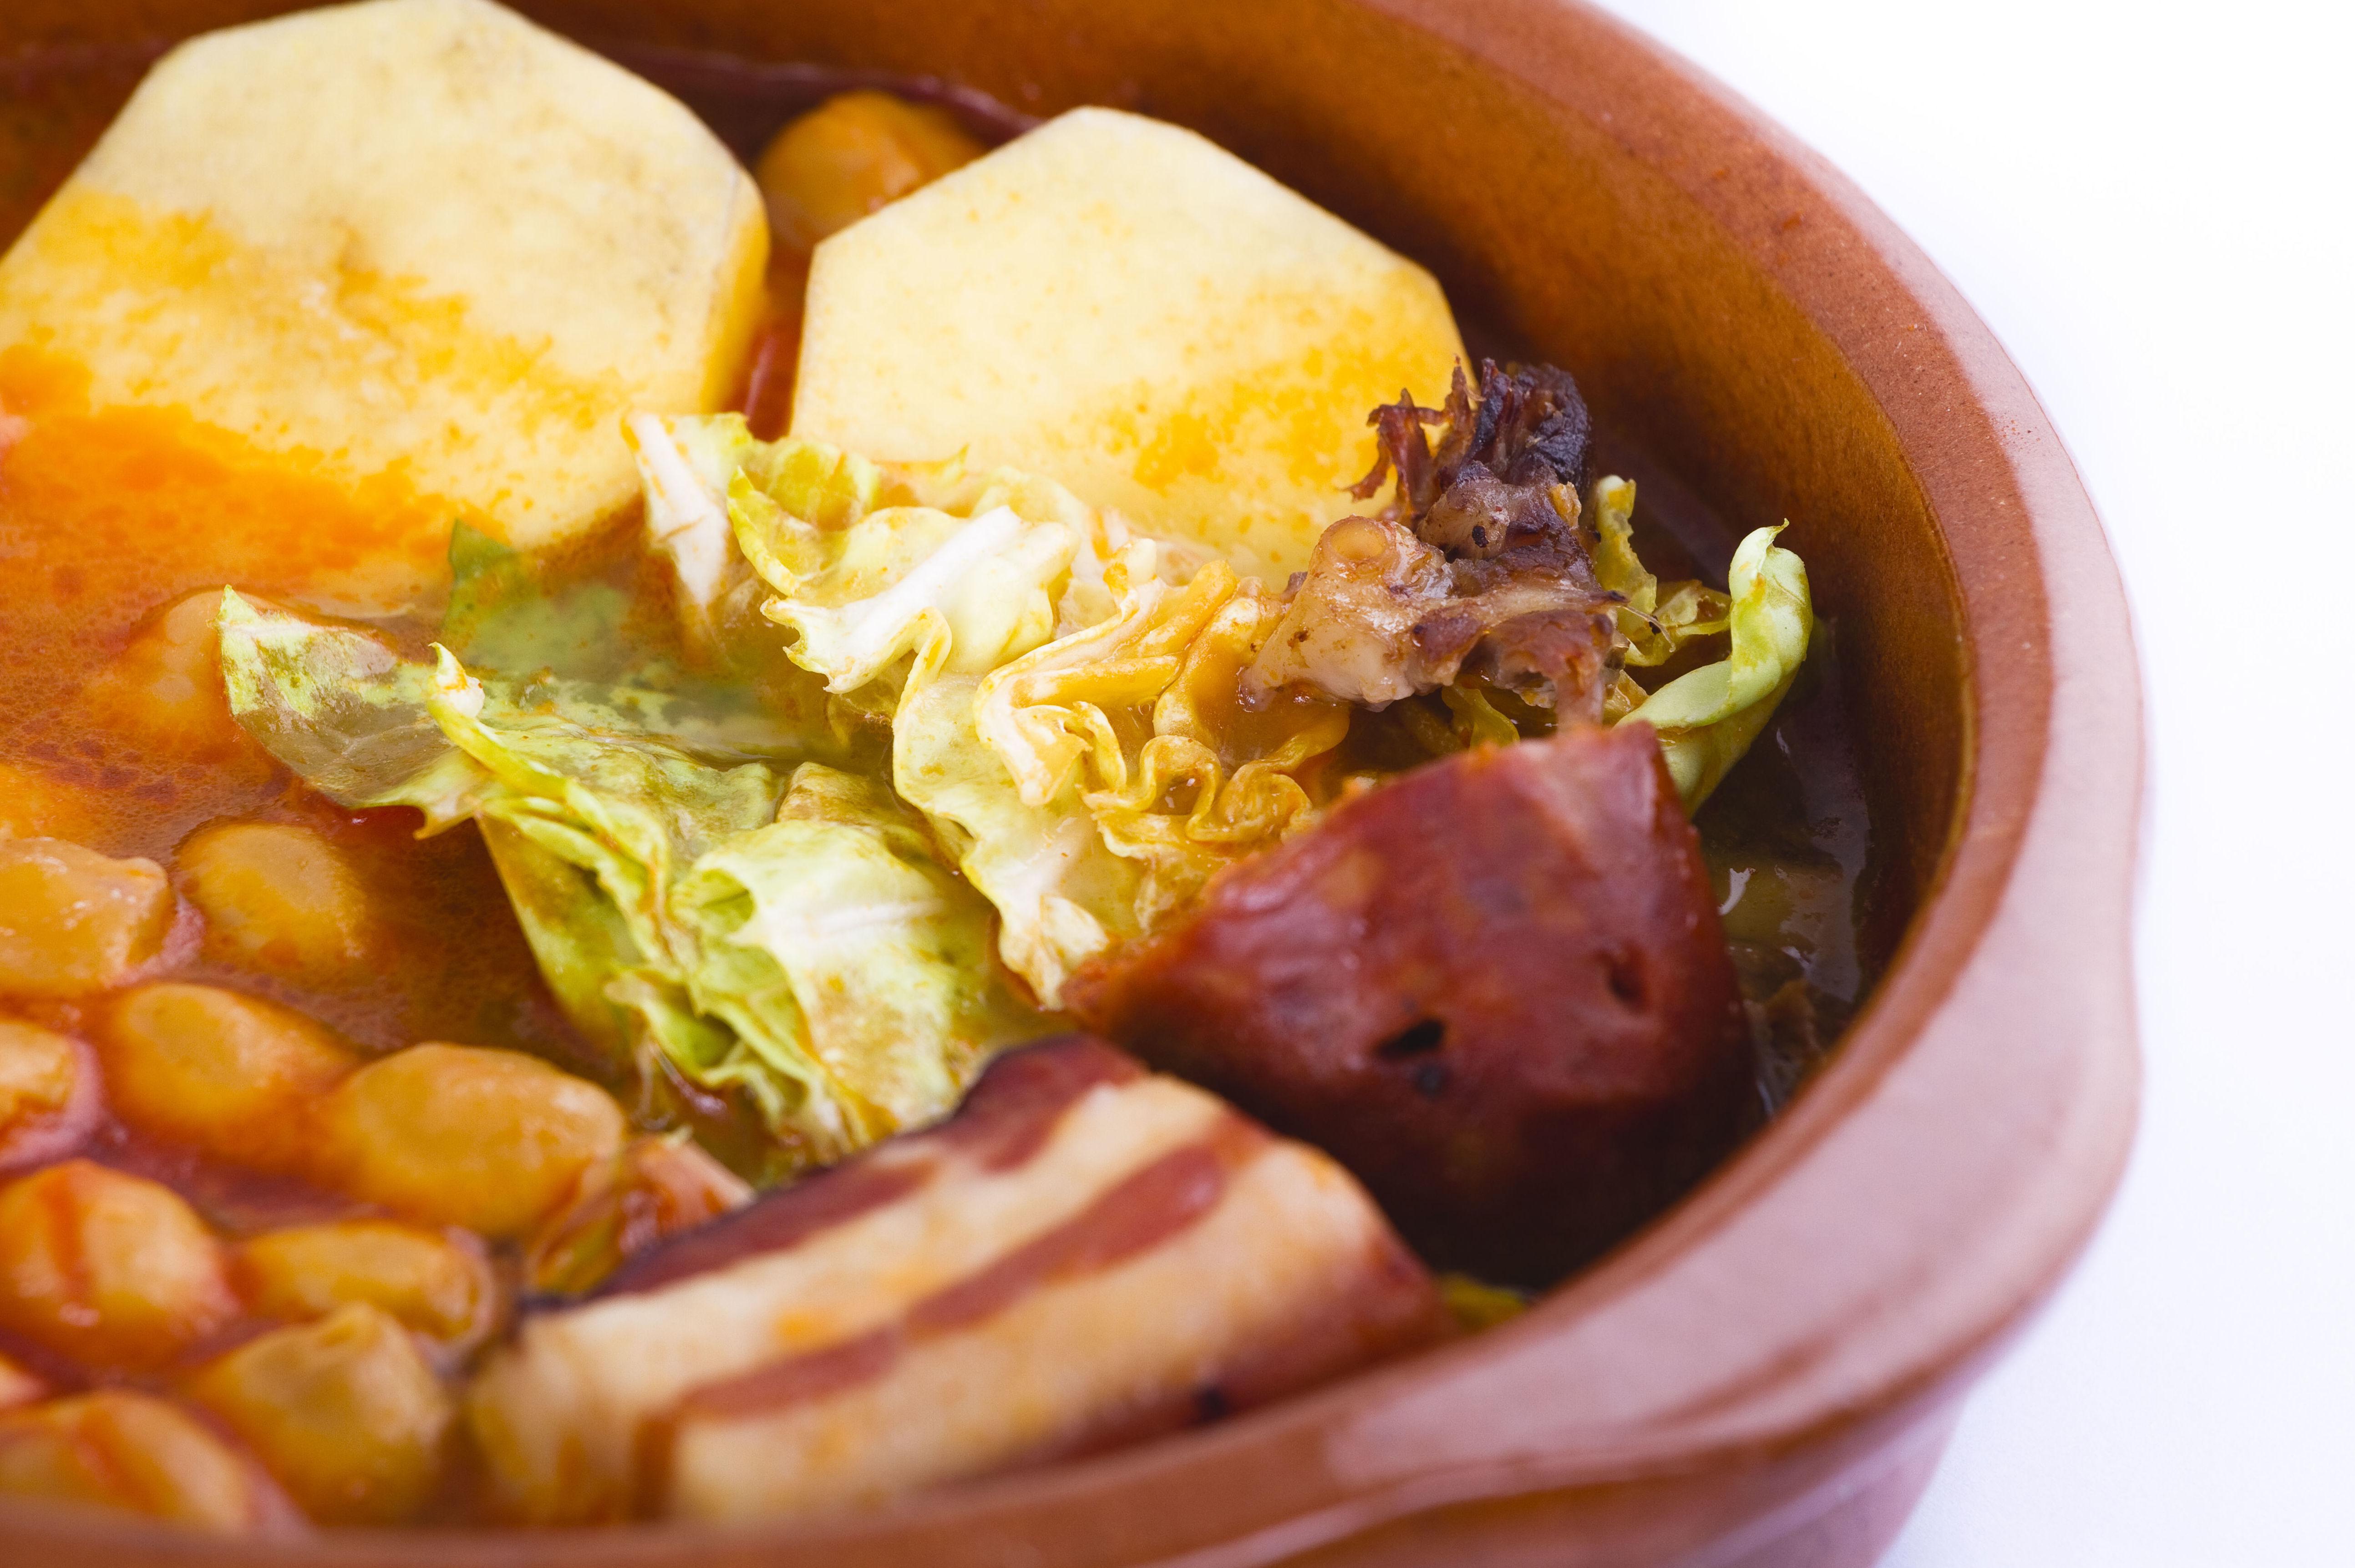 Comida casera para llevar en Sarrià-Sant Gervasi, Barcelona